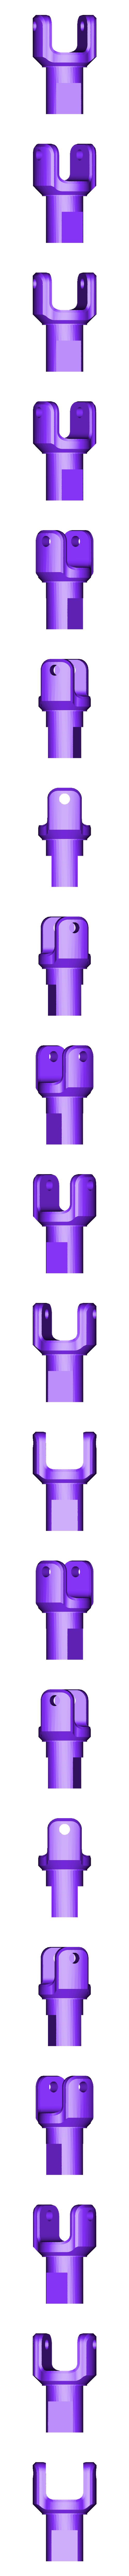 Truck_V4_Axle_Ujoint2.STL Download STL file 3D Printed Rc Truck V4 • 3D printable template, MrCrankyface